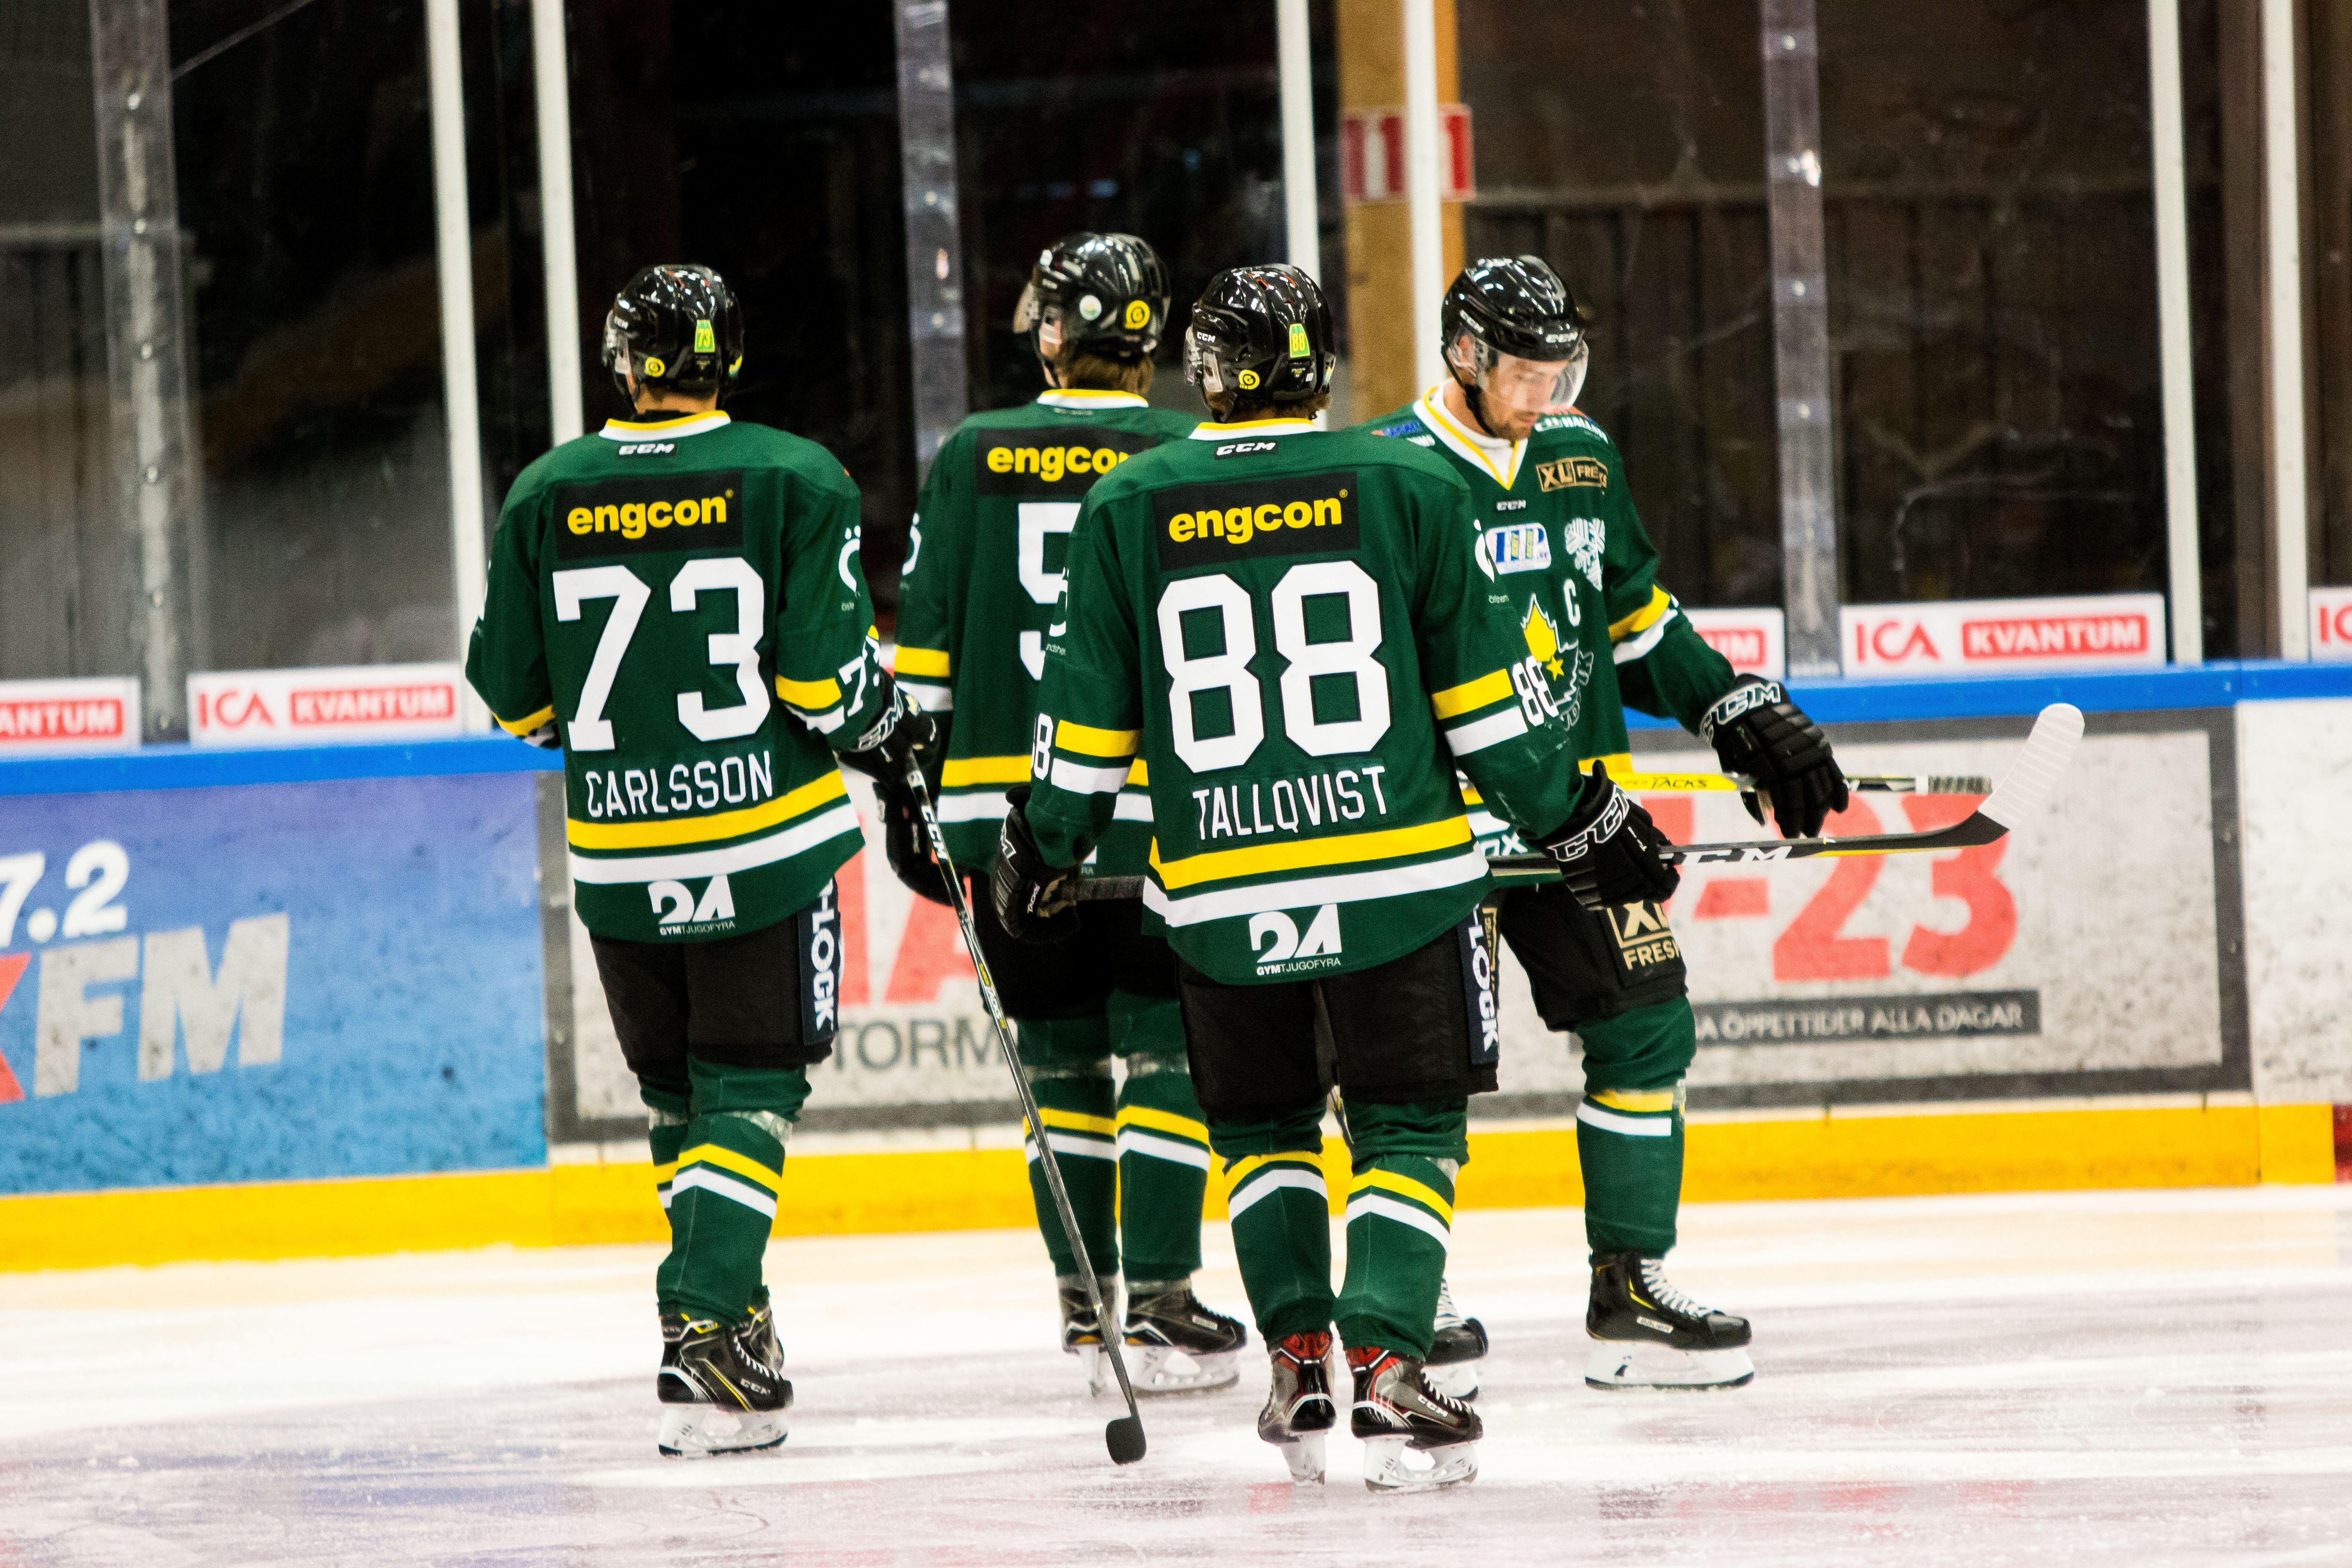 Hockey: ÖIK vs Piteå